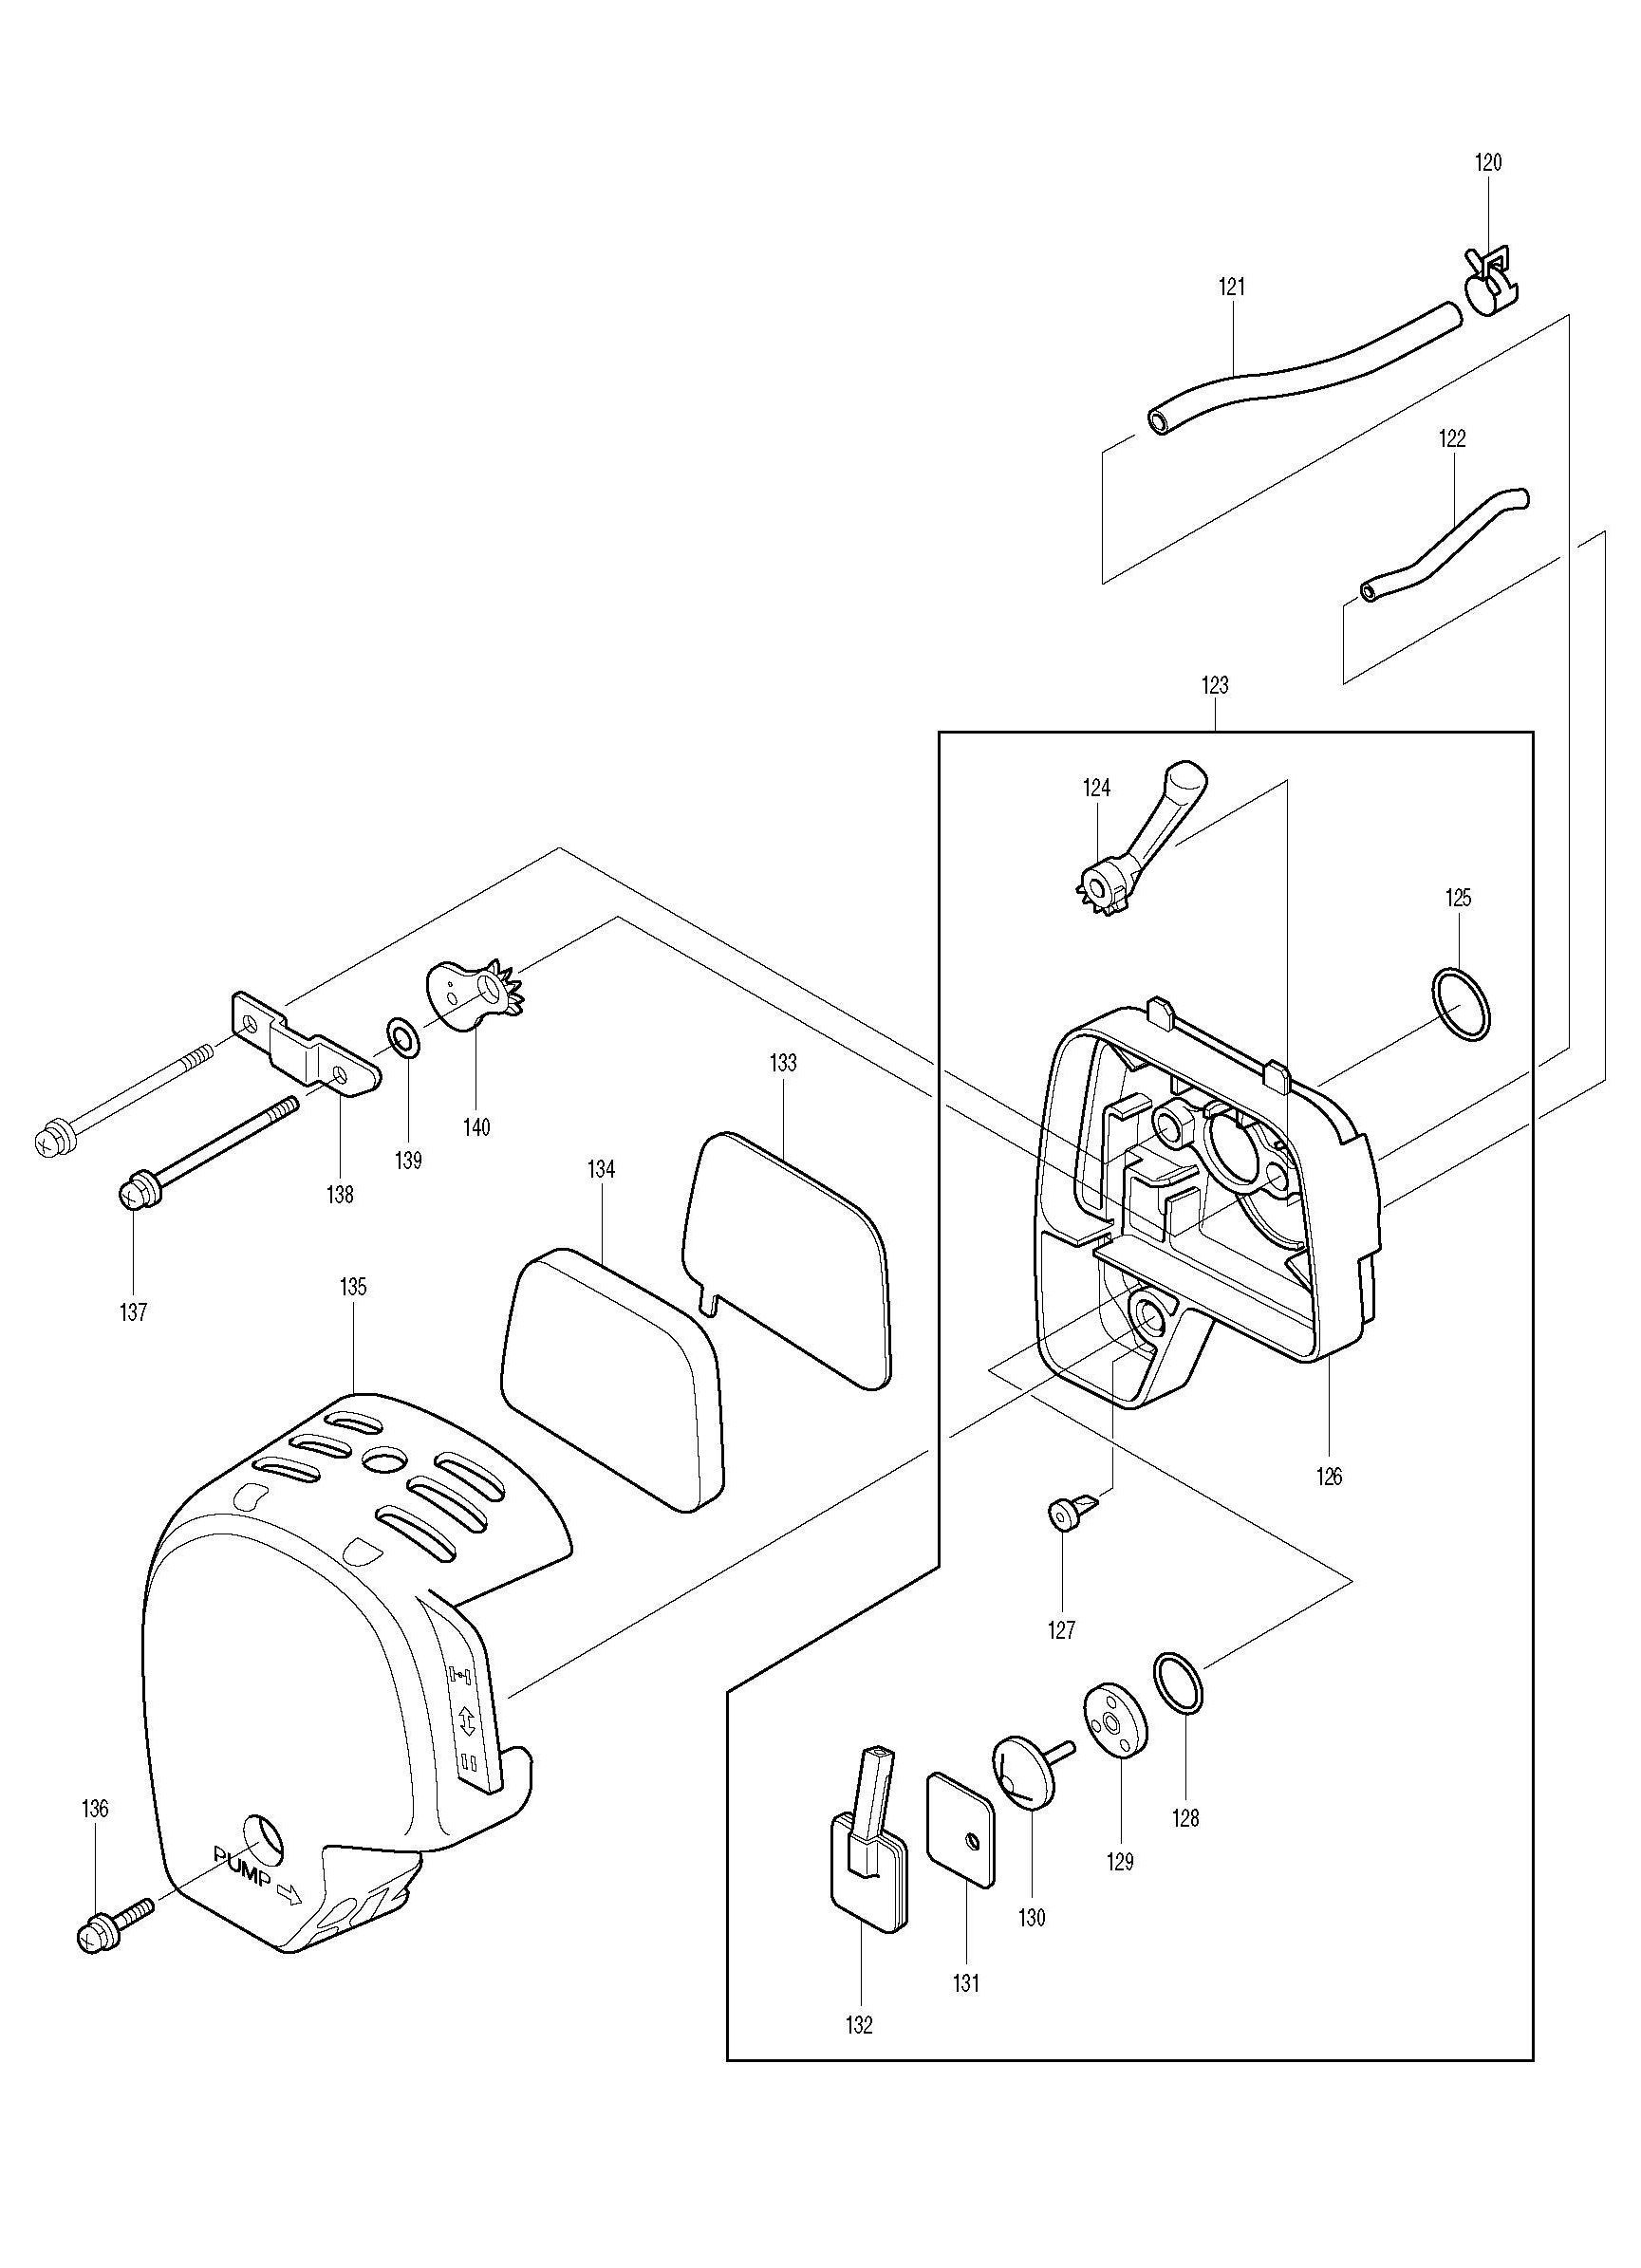 Makita Blower Wiring Diagram Diagrams Data Base For Toro 4 Stroke Petrol Engine My Rh Detoxicrecenze Com On Cutler Hammer Spares